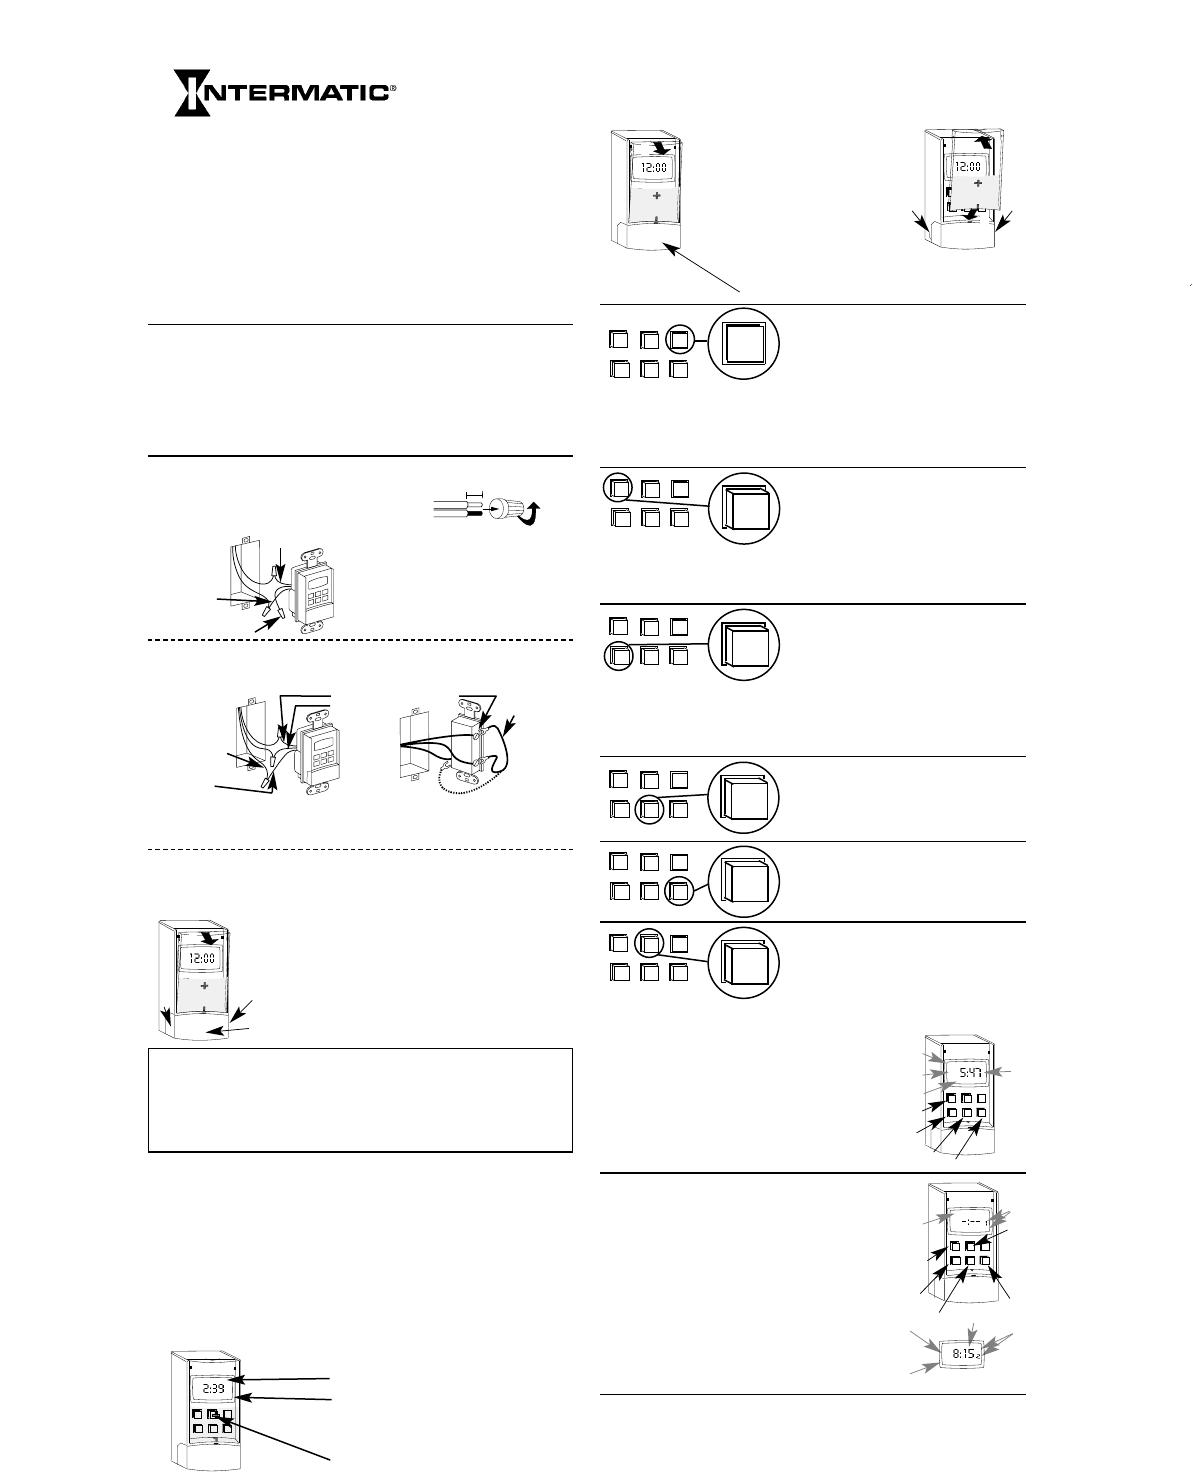 Intermatic Light Timer Ss7c Manual Manual Guide